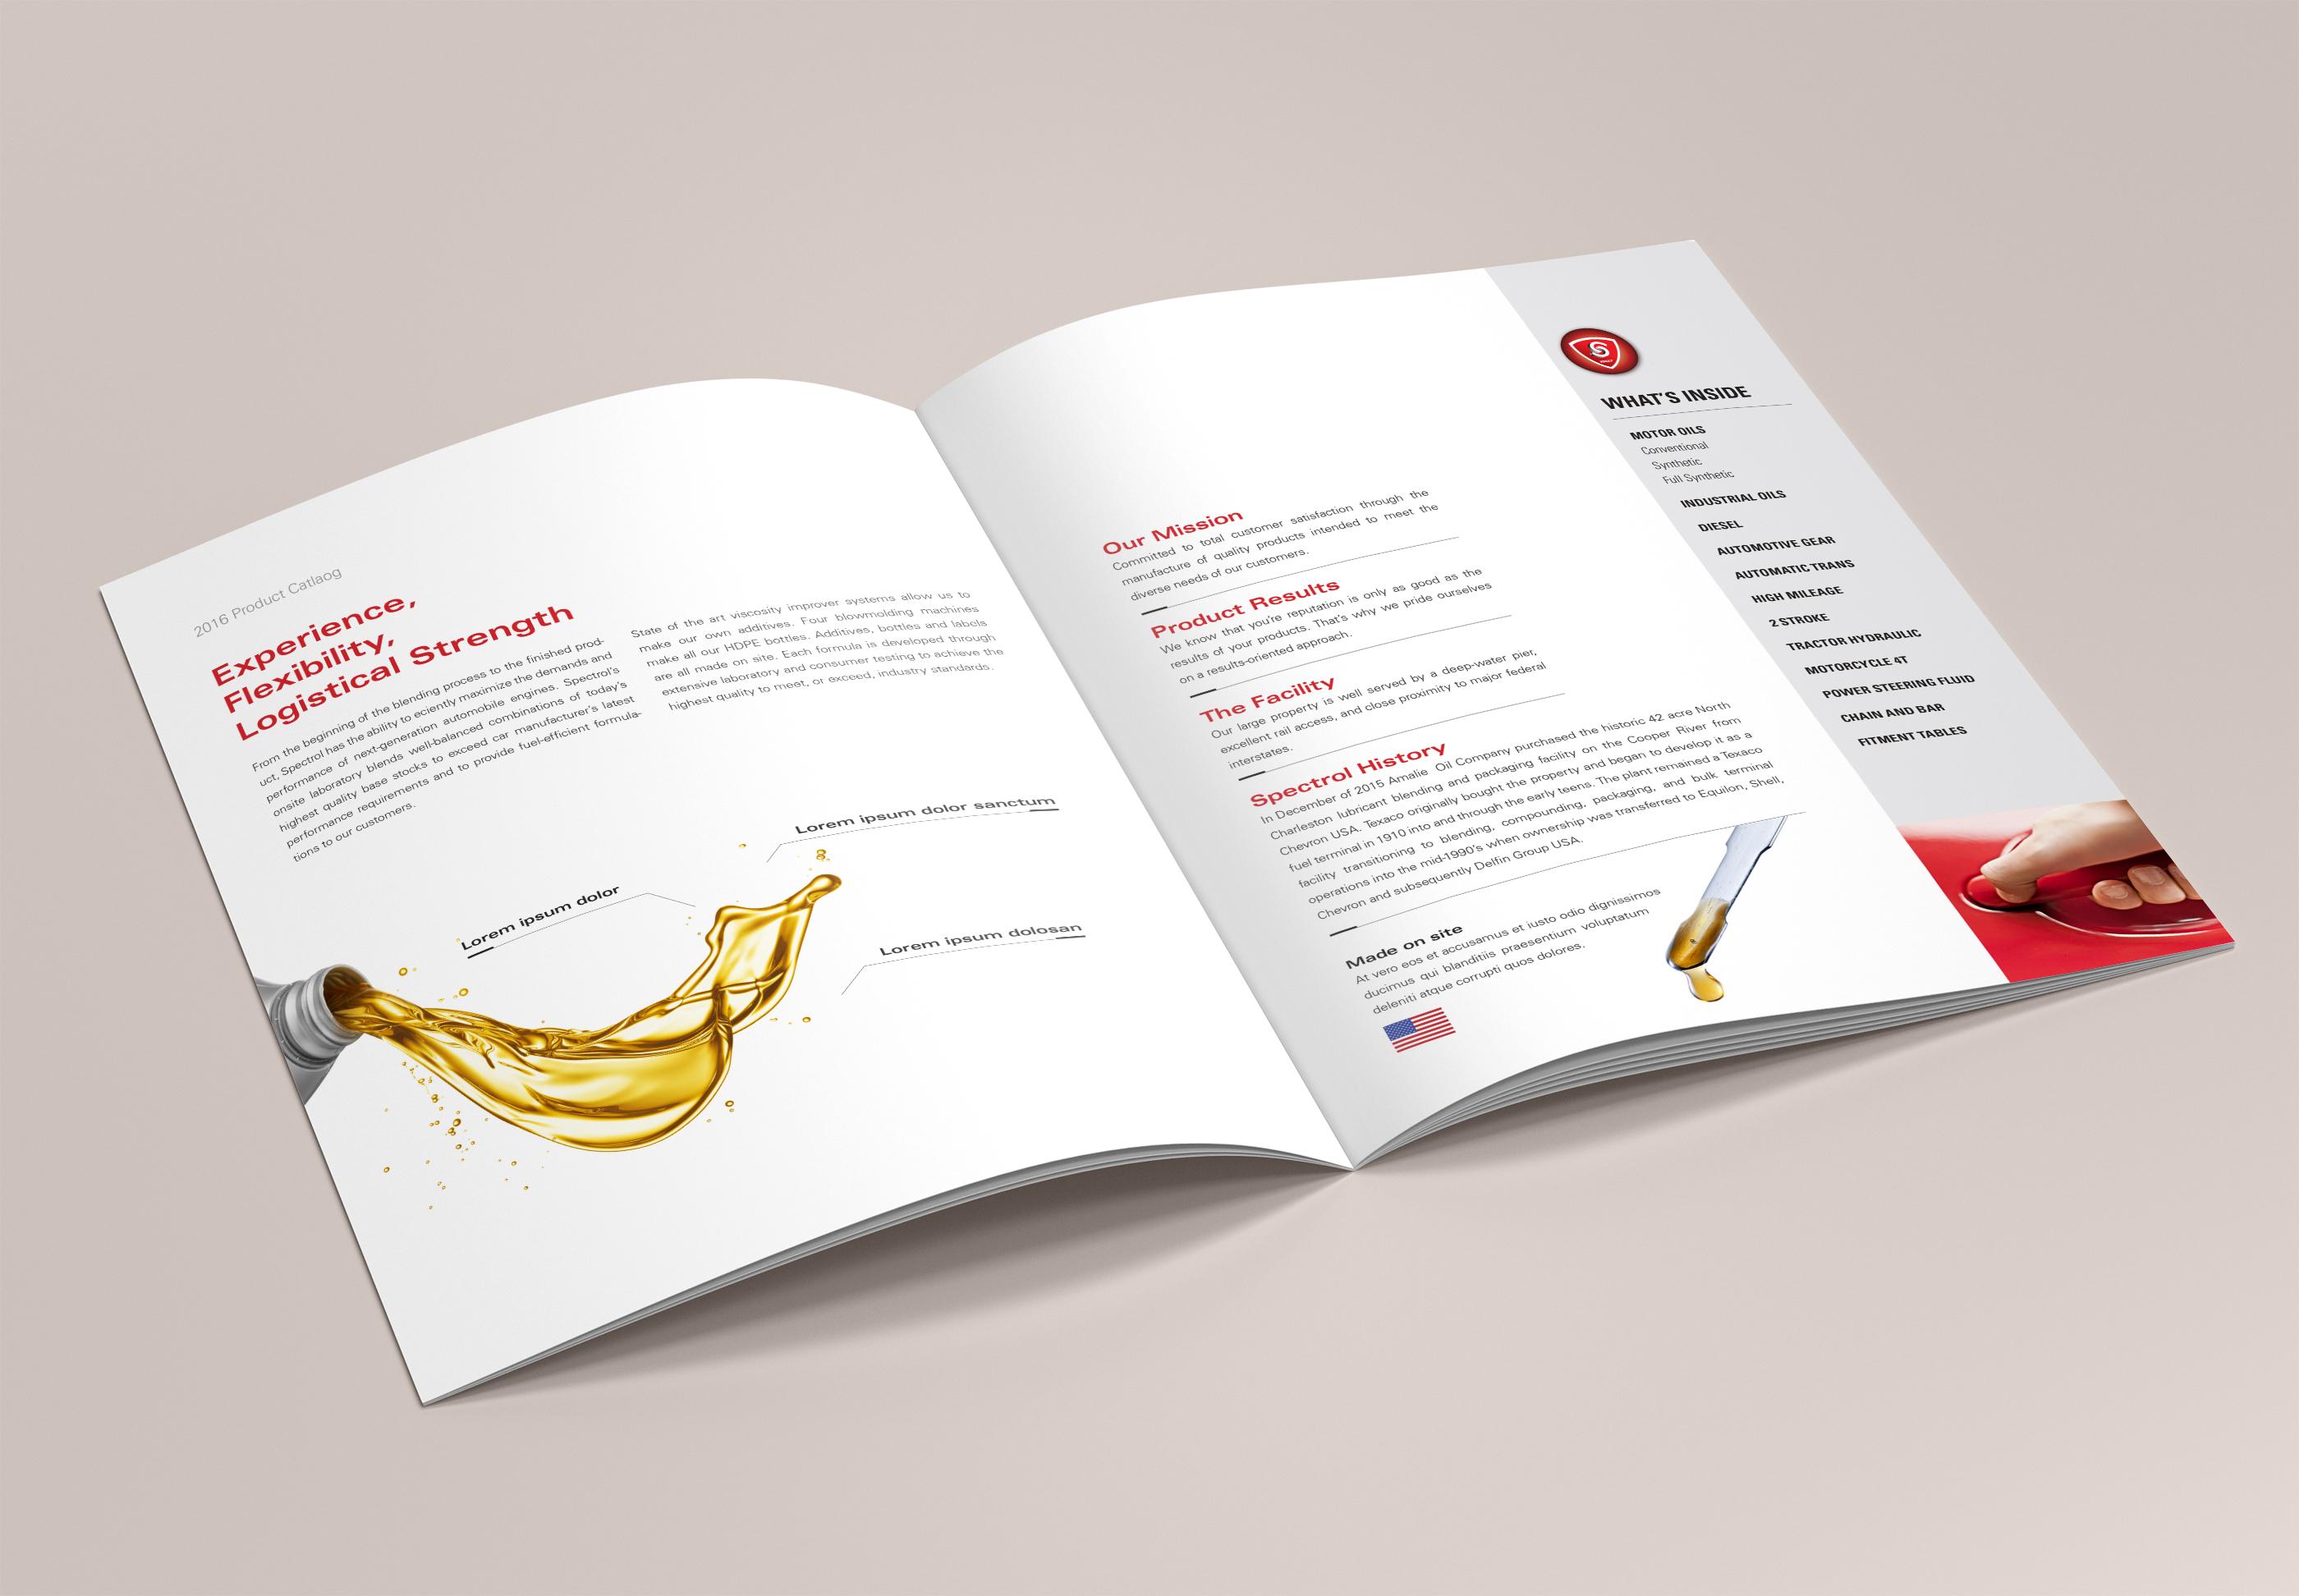 Catalog design cellacore for Best catalog design 2016